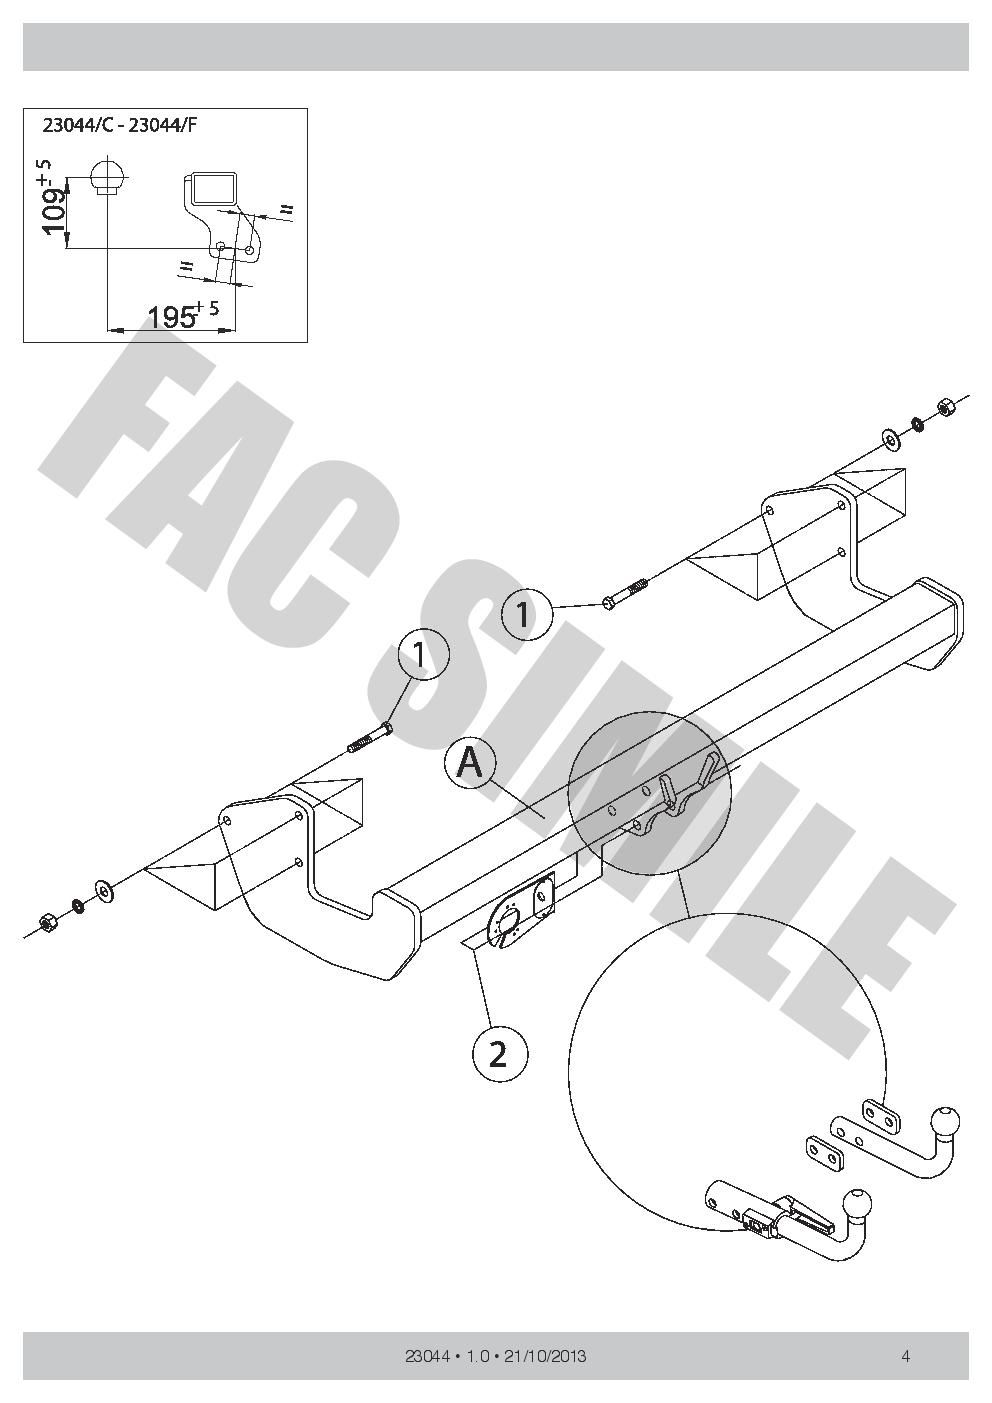 AHK Abnehmbare Anhängerkupplung 7p E-Satz Mercedes Viano MPV 05-14 23044/_A2